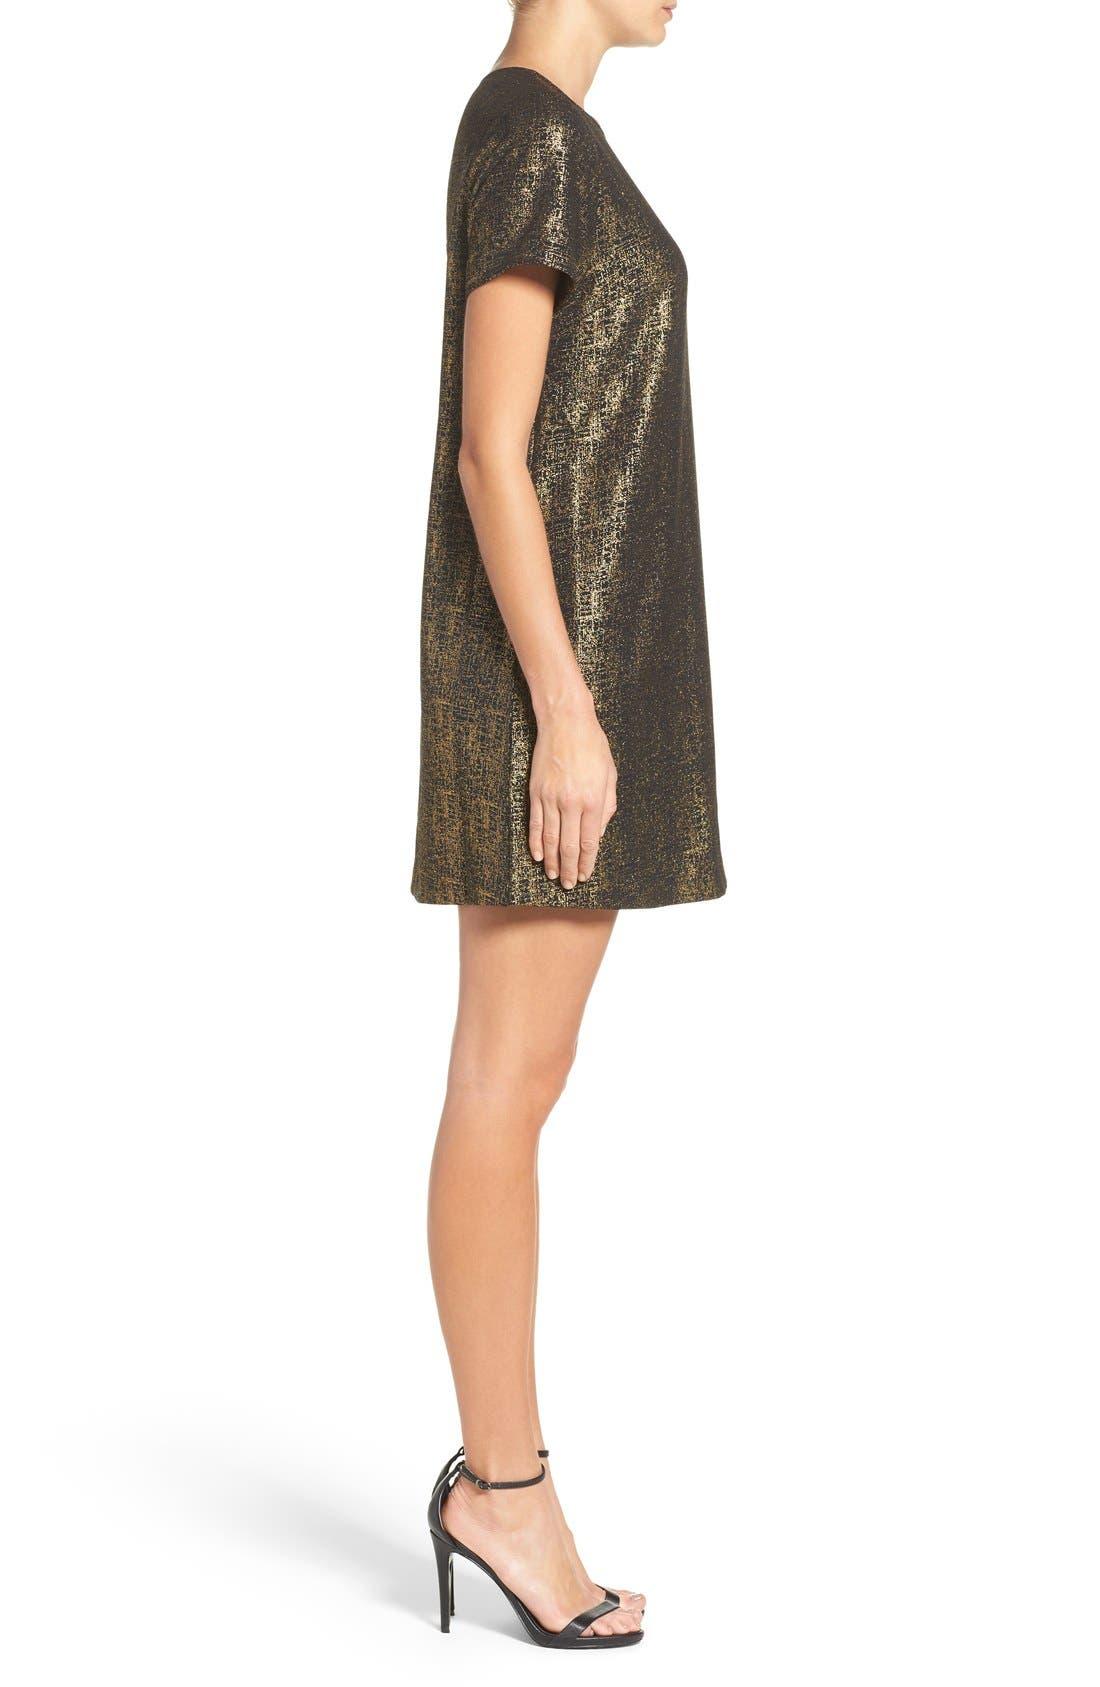 Amy Metallic Shift Dress,                             Alternate thumbnail 3, color,                             Black/ Gold